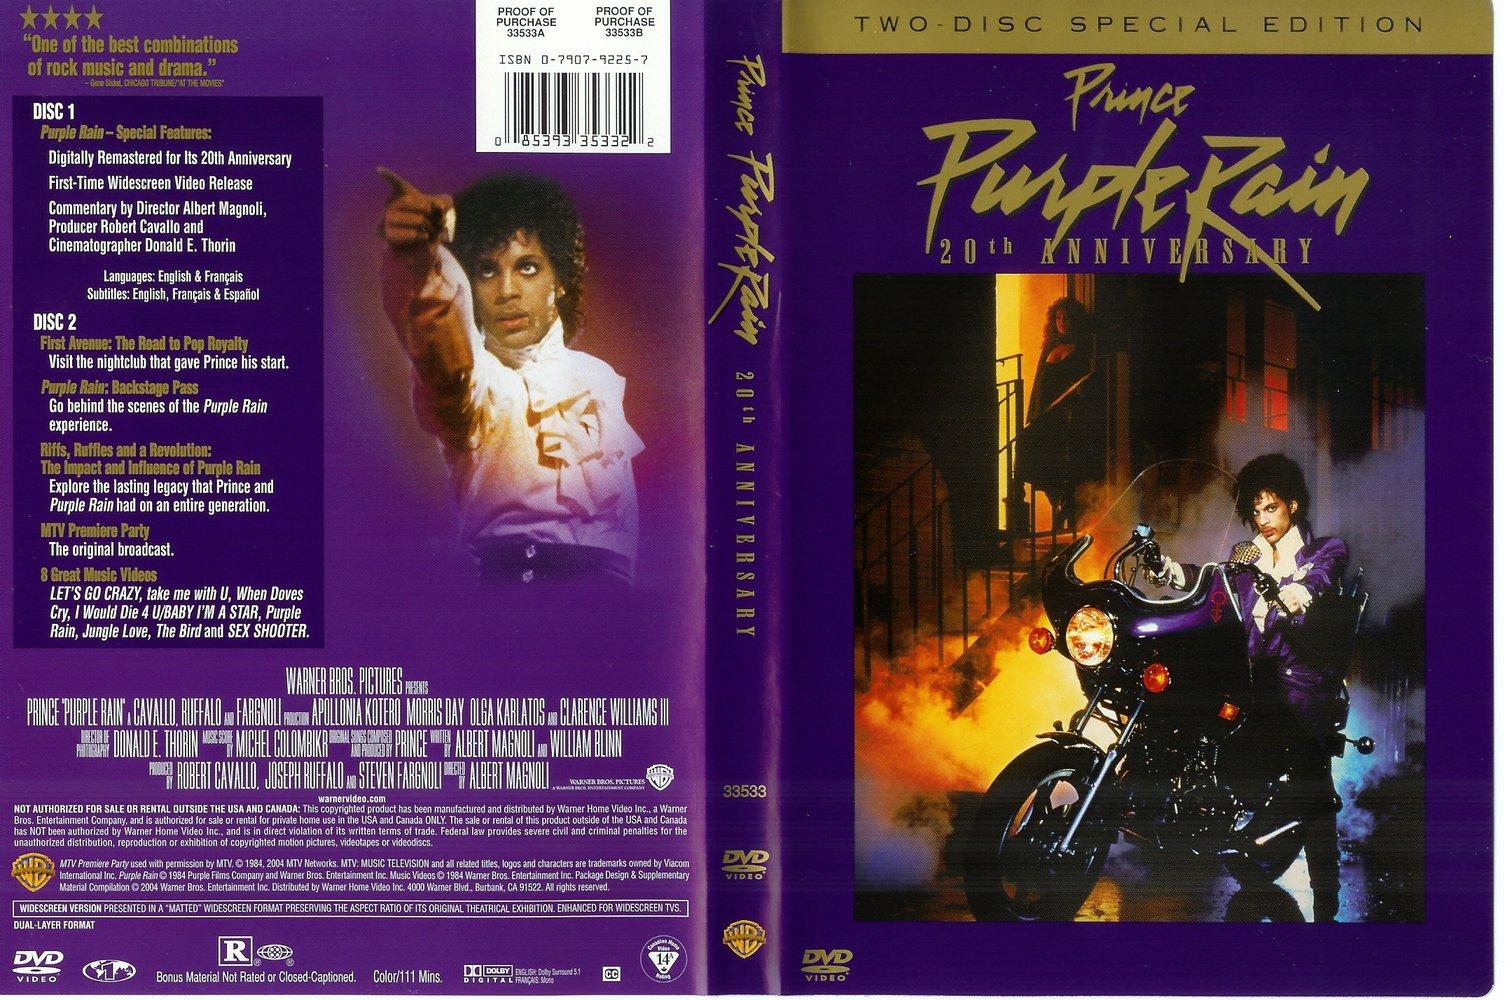 Prince - Purple Rain DVD 20th Anniversary 2disc